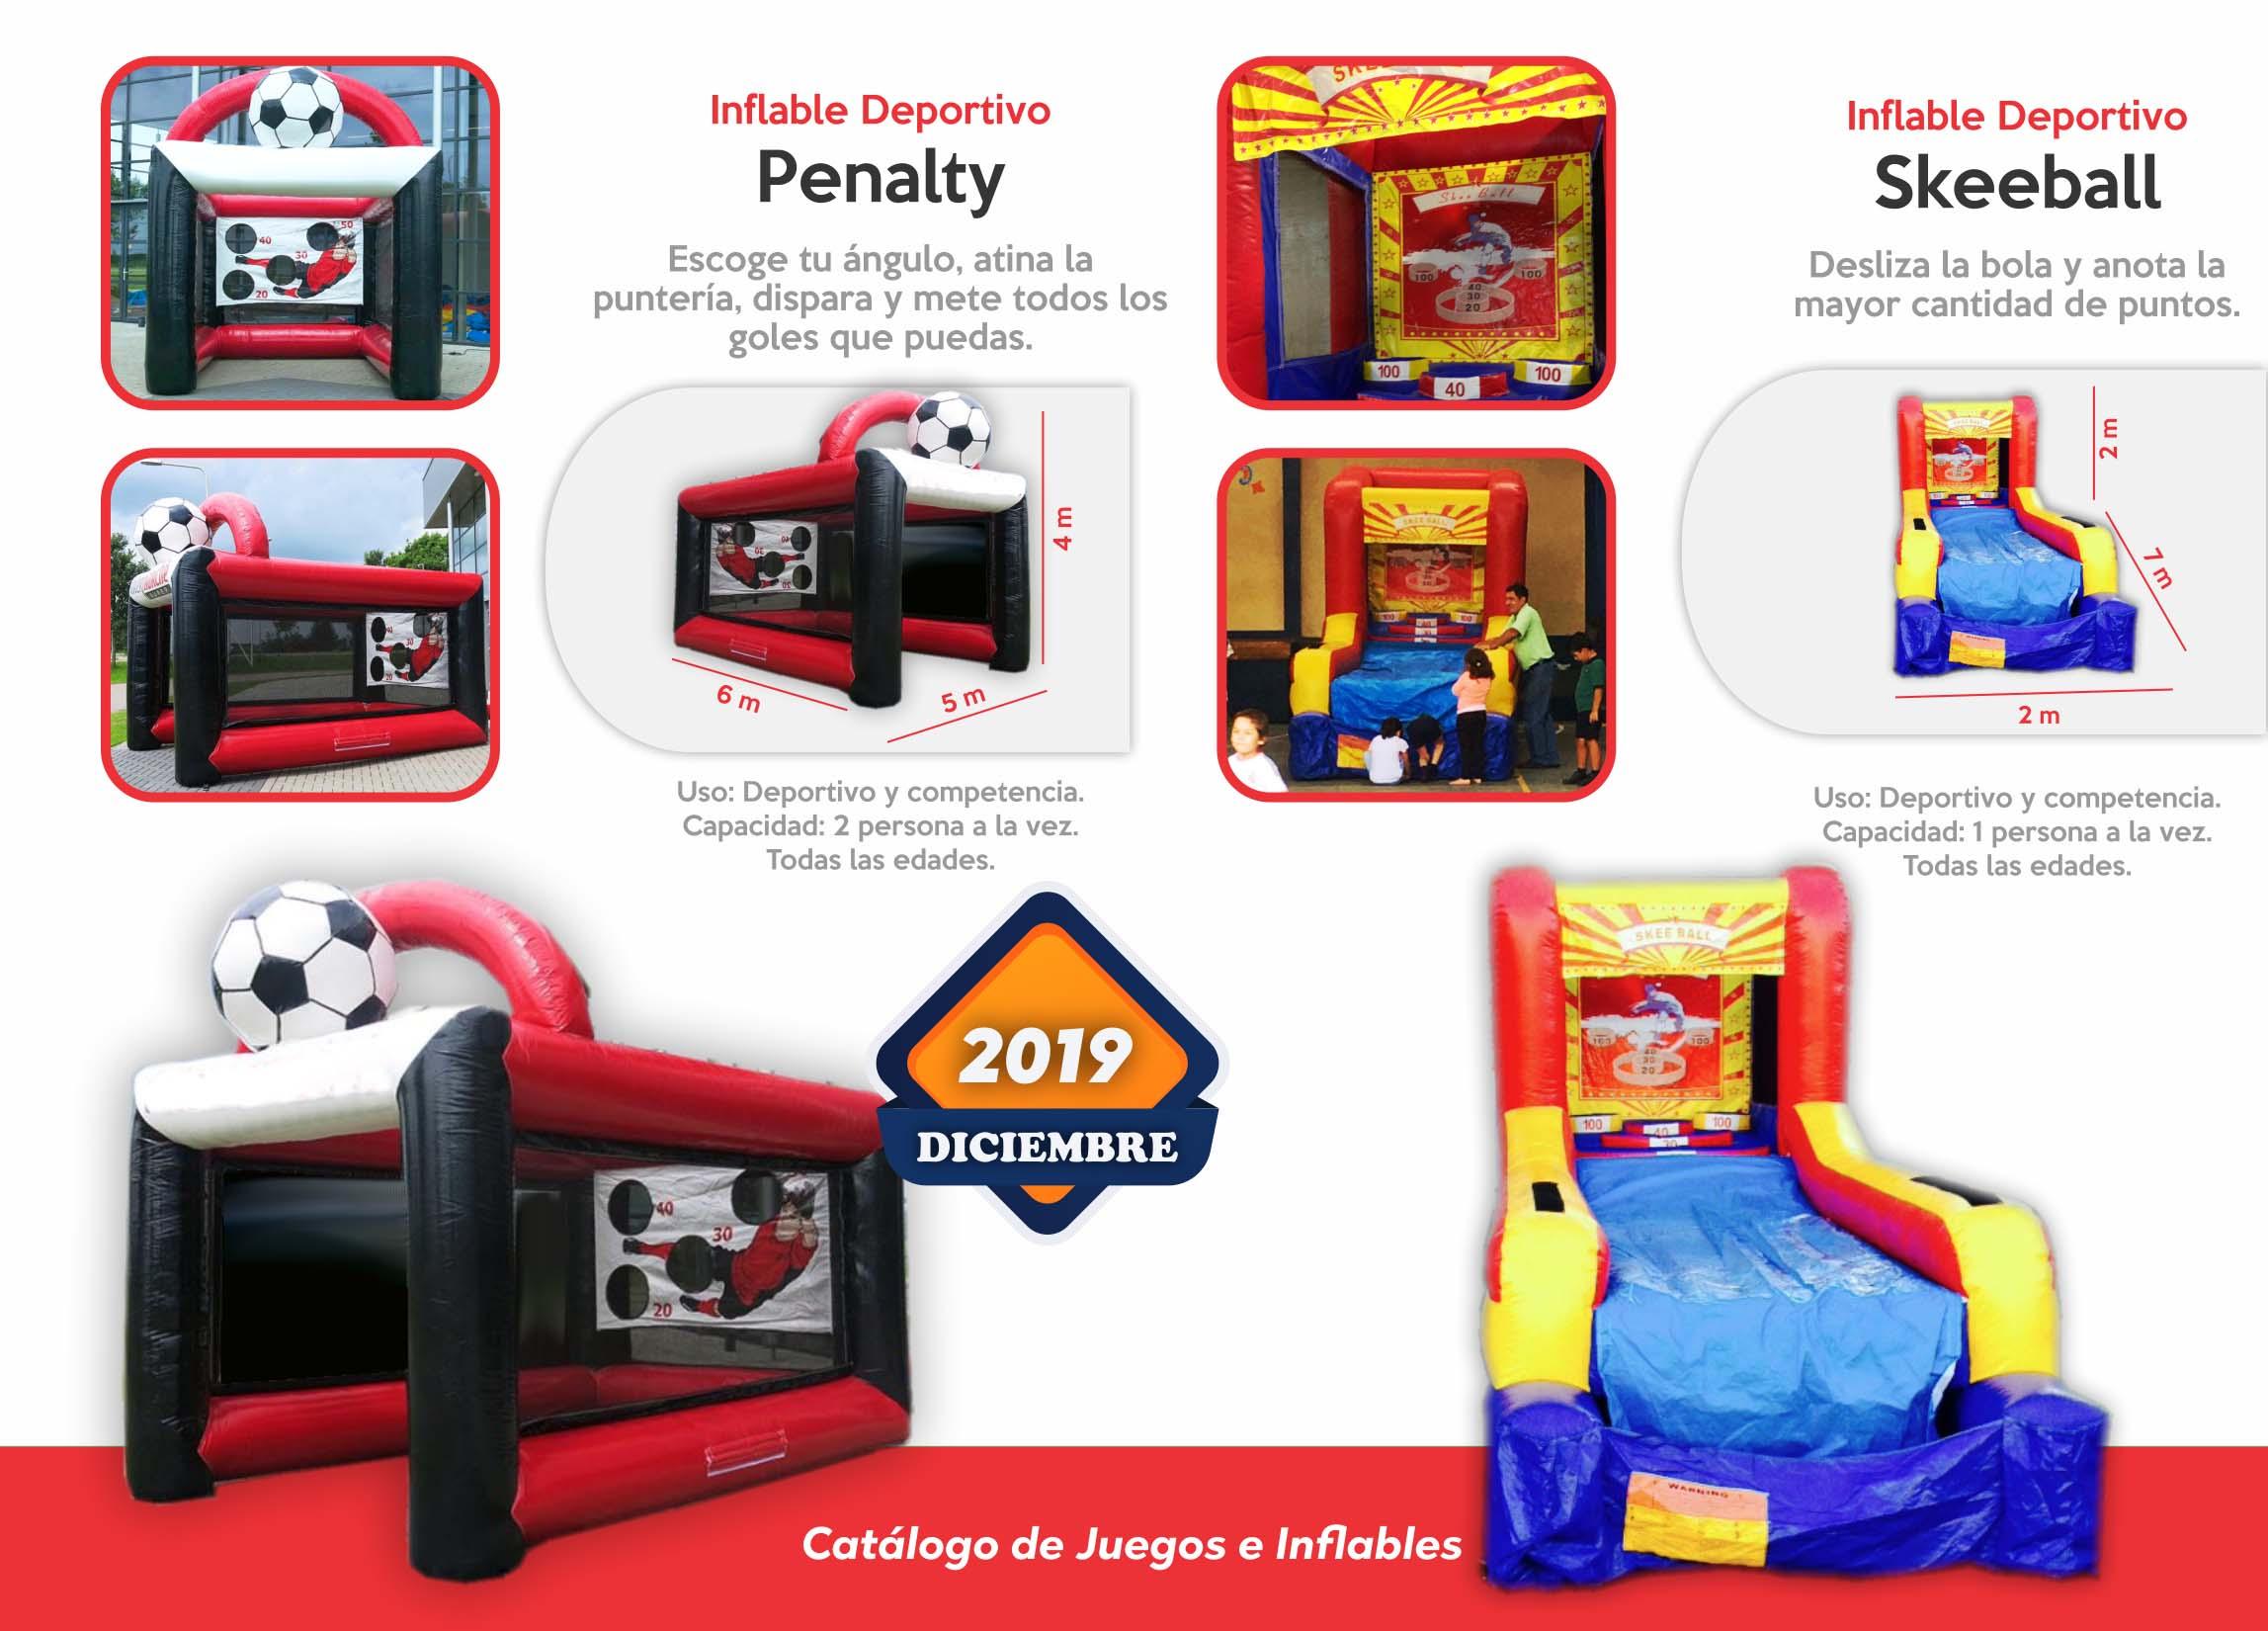 Penalty - Skeeball